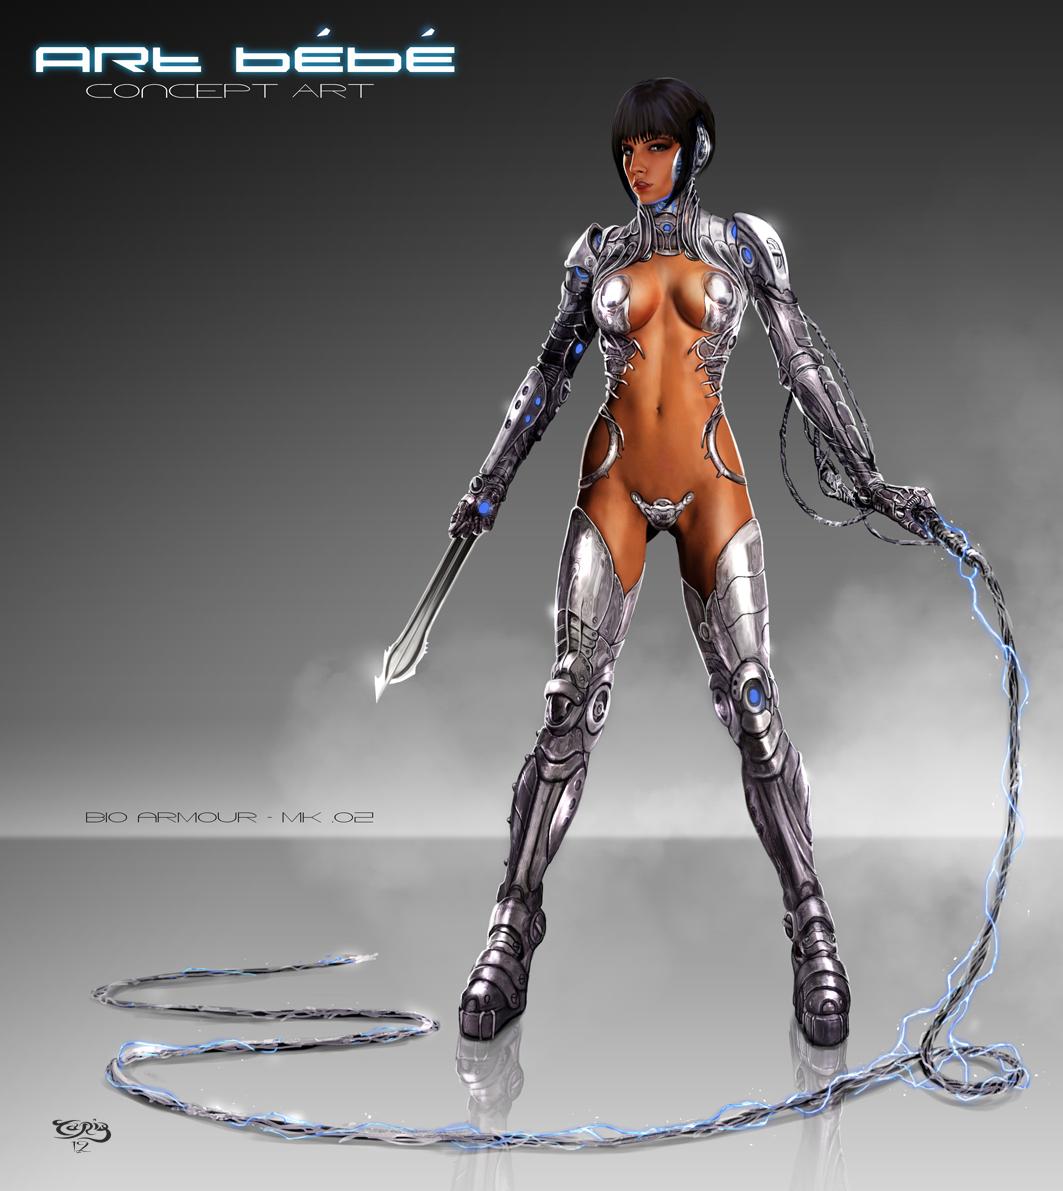 Art Bebe_Bio Armor MK002 by tariq12